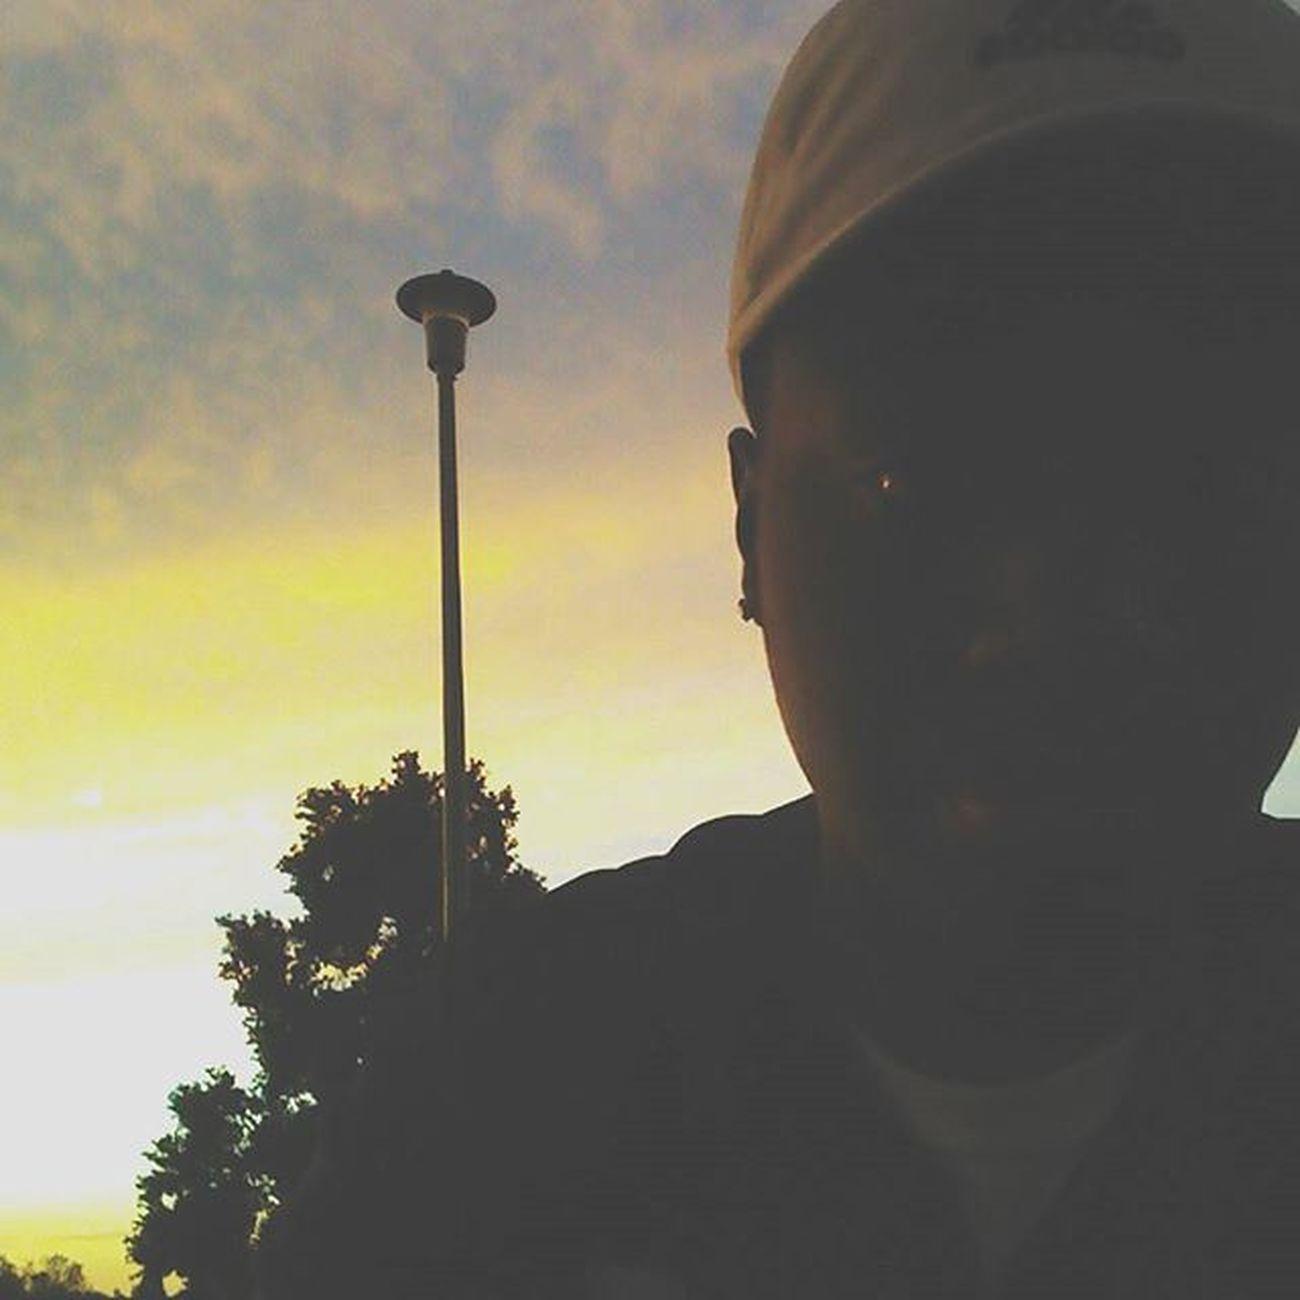 Mid Day Chill• Nichi\Trilluminati®\ ✞✞✞ Nichi Bape Addidas Stussy Supremeny Ethik  Mensfashion Kycvintage Tillys NewBalance Asics Nike Airmax Yeezy Trilluminati Trill Supremejordan Sacramento California Sactown 916 Trend Trendy Trendpig Vintage